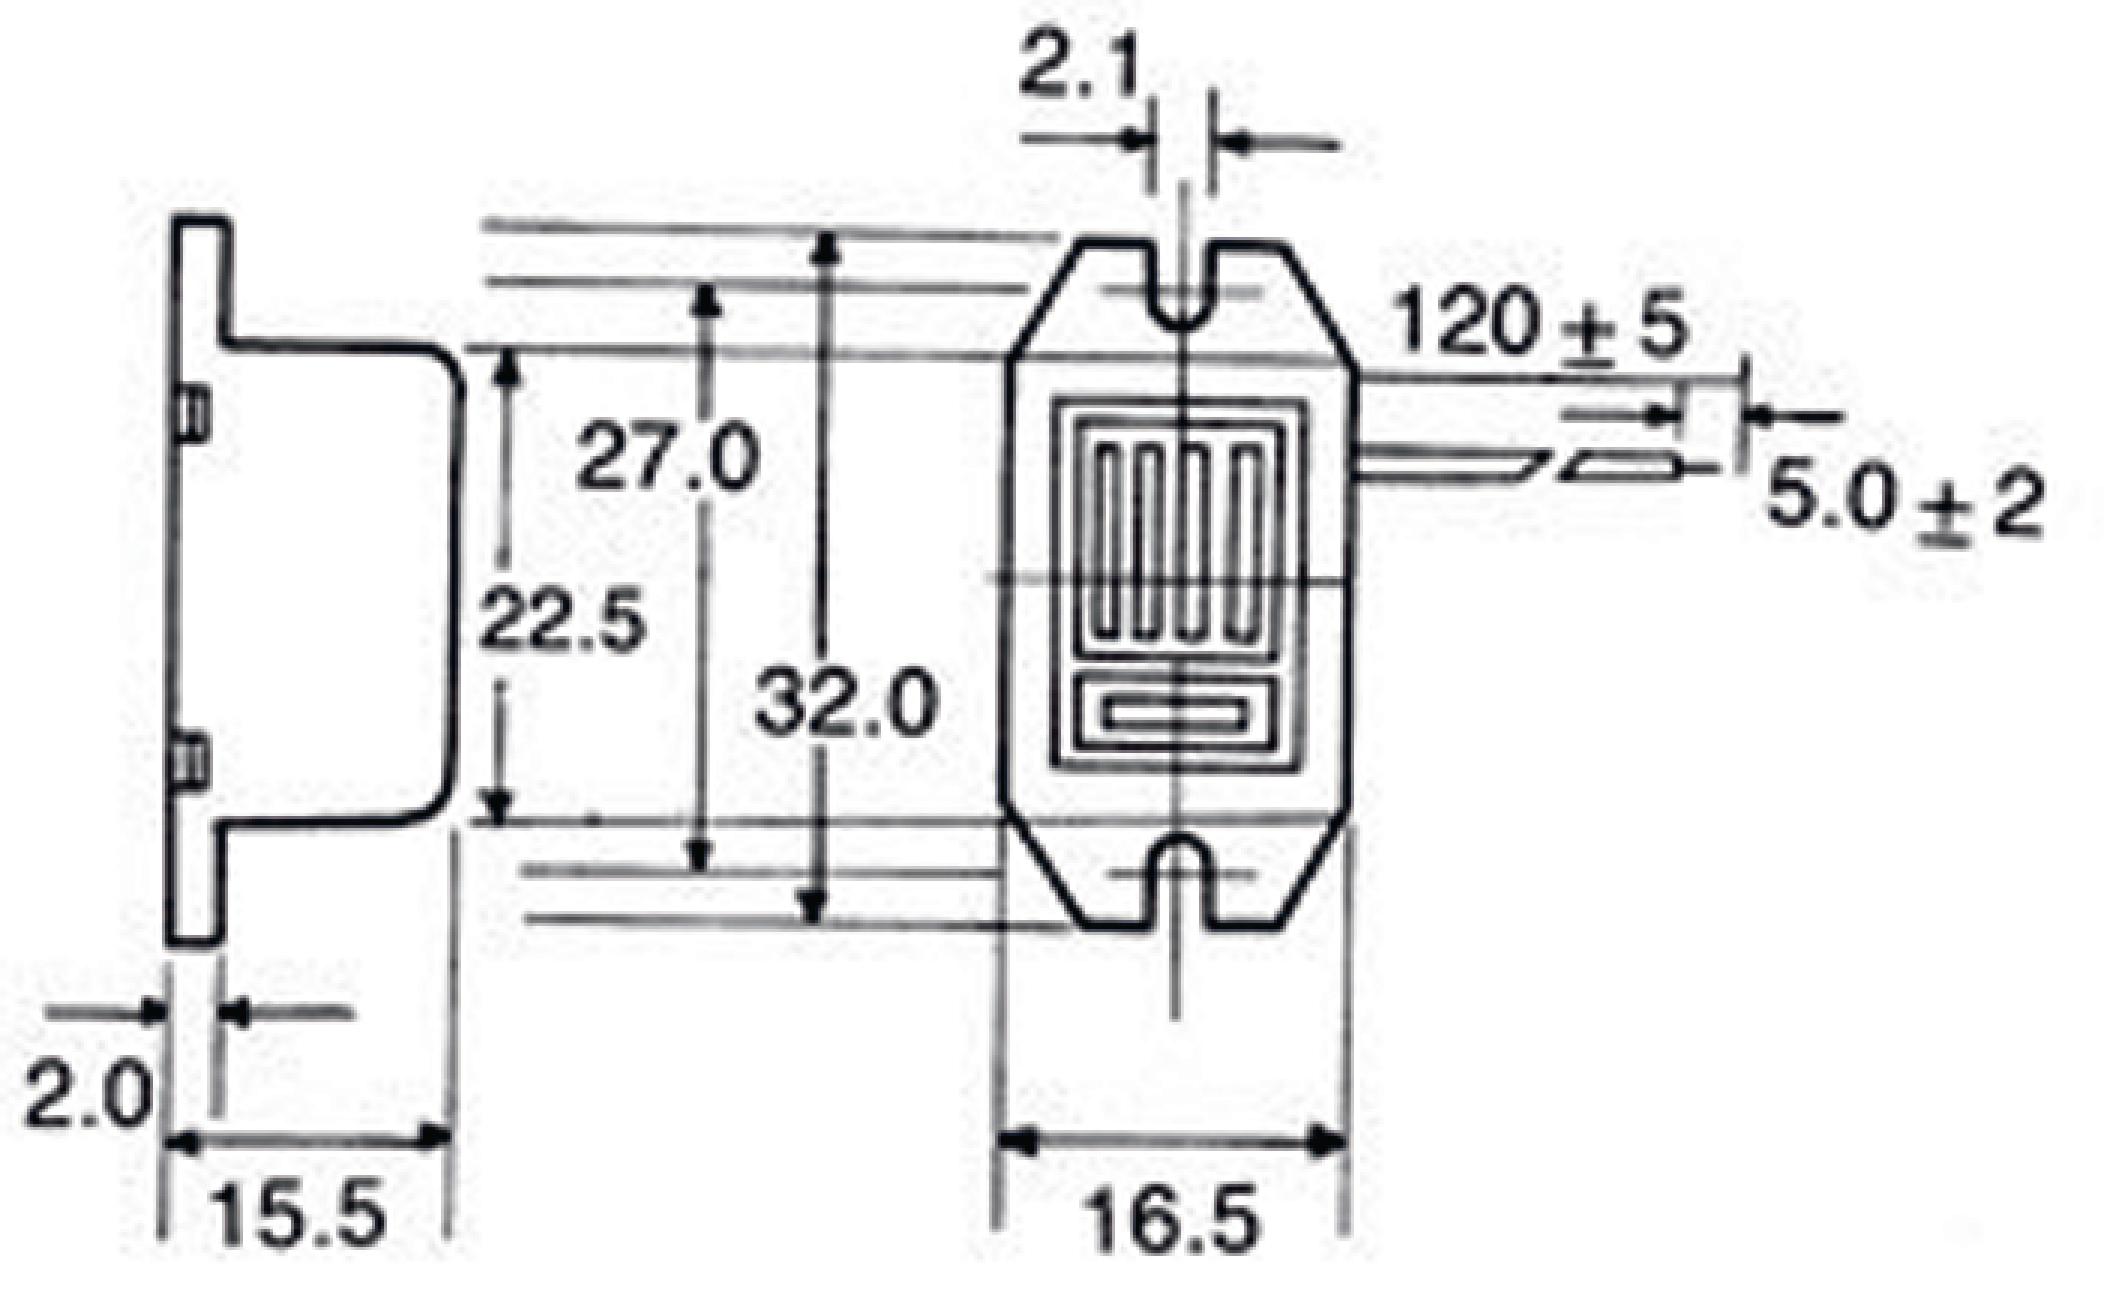 bz-14 - fixapart - buzzer ks3612